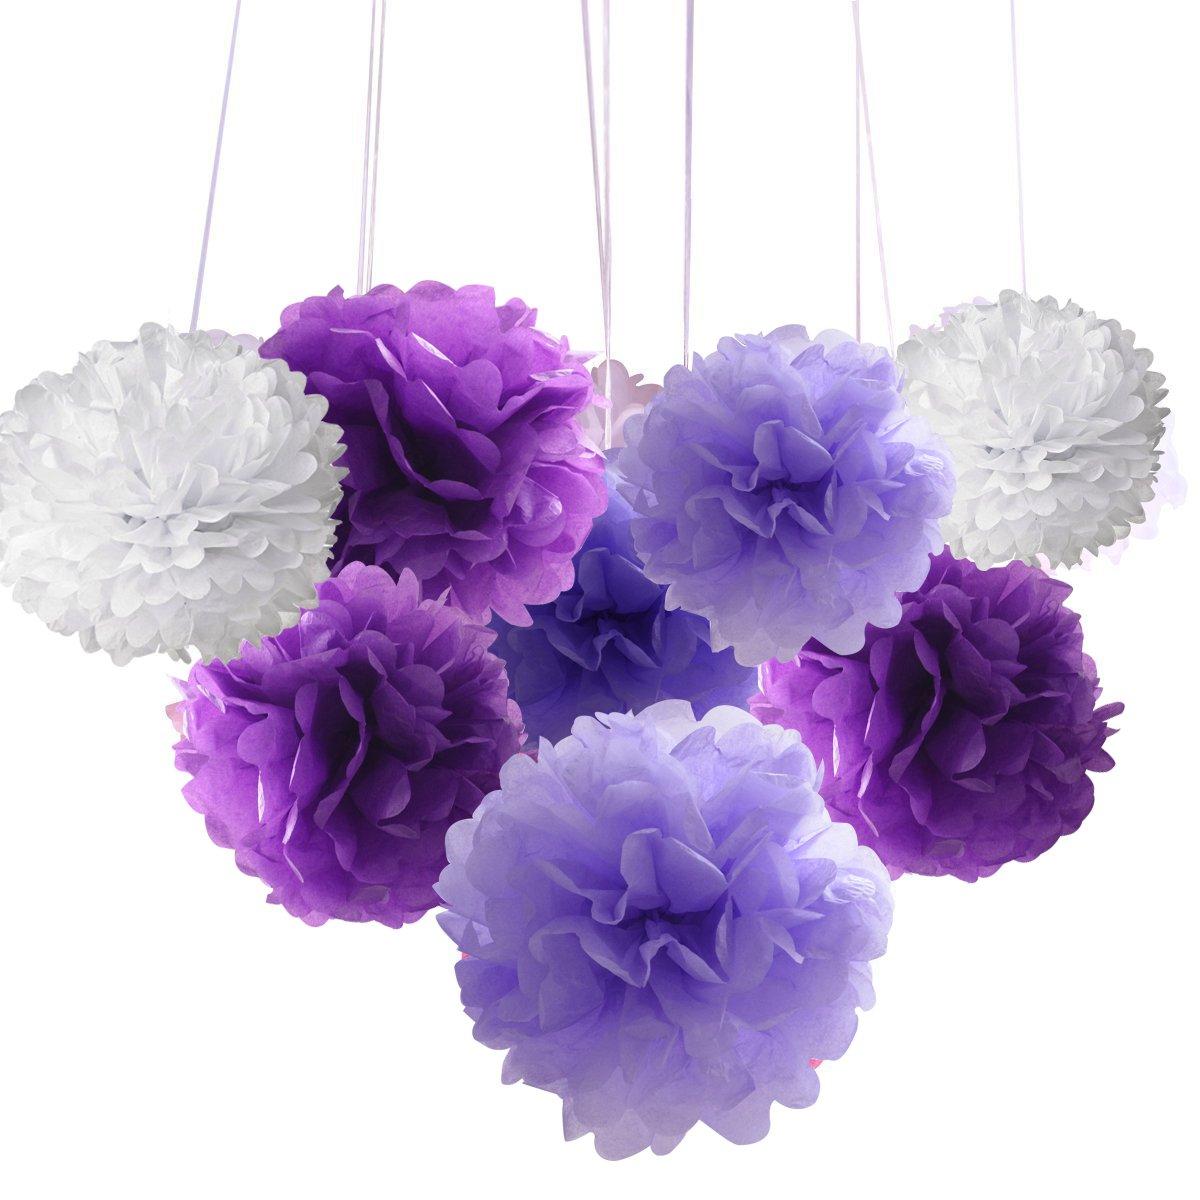 18pcs Tissue Hanging Paper Pom-poms Hmxpls Flower Ball Wedding Party Outdoor Decoration Premium Tissue Paper Pom Pom Flowers Craft Kit 8// 10// 12 Pink/& White